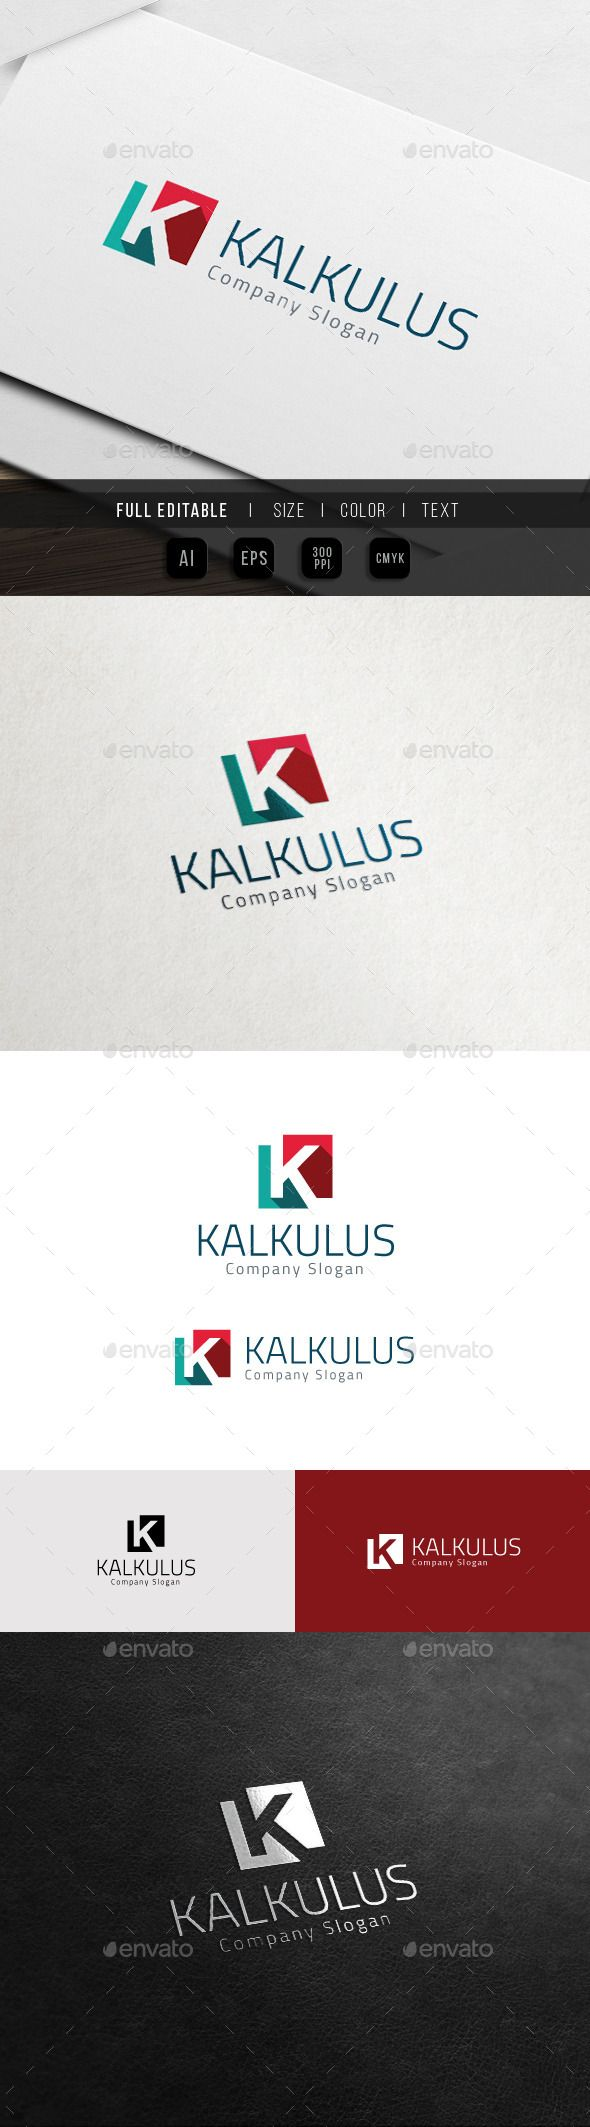 Corporate brand marketing finance  logo letters templates diseno de logotipos also rh ar pinterest